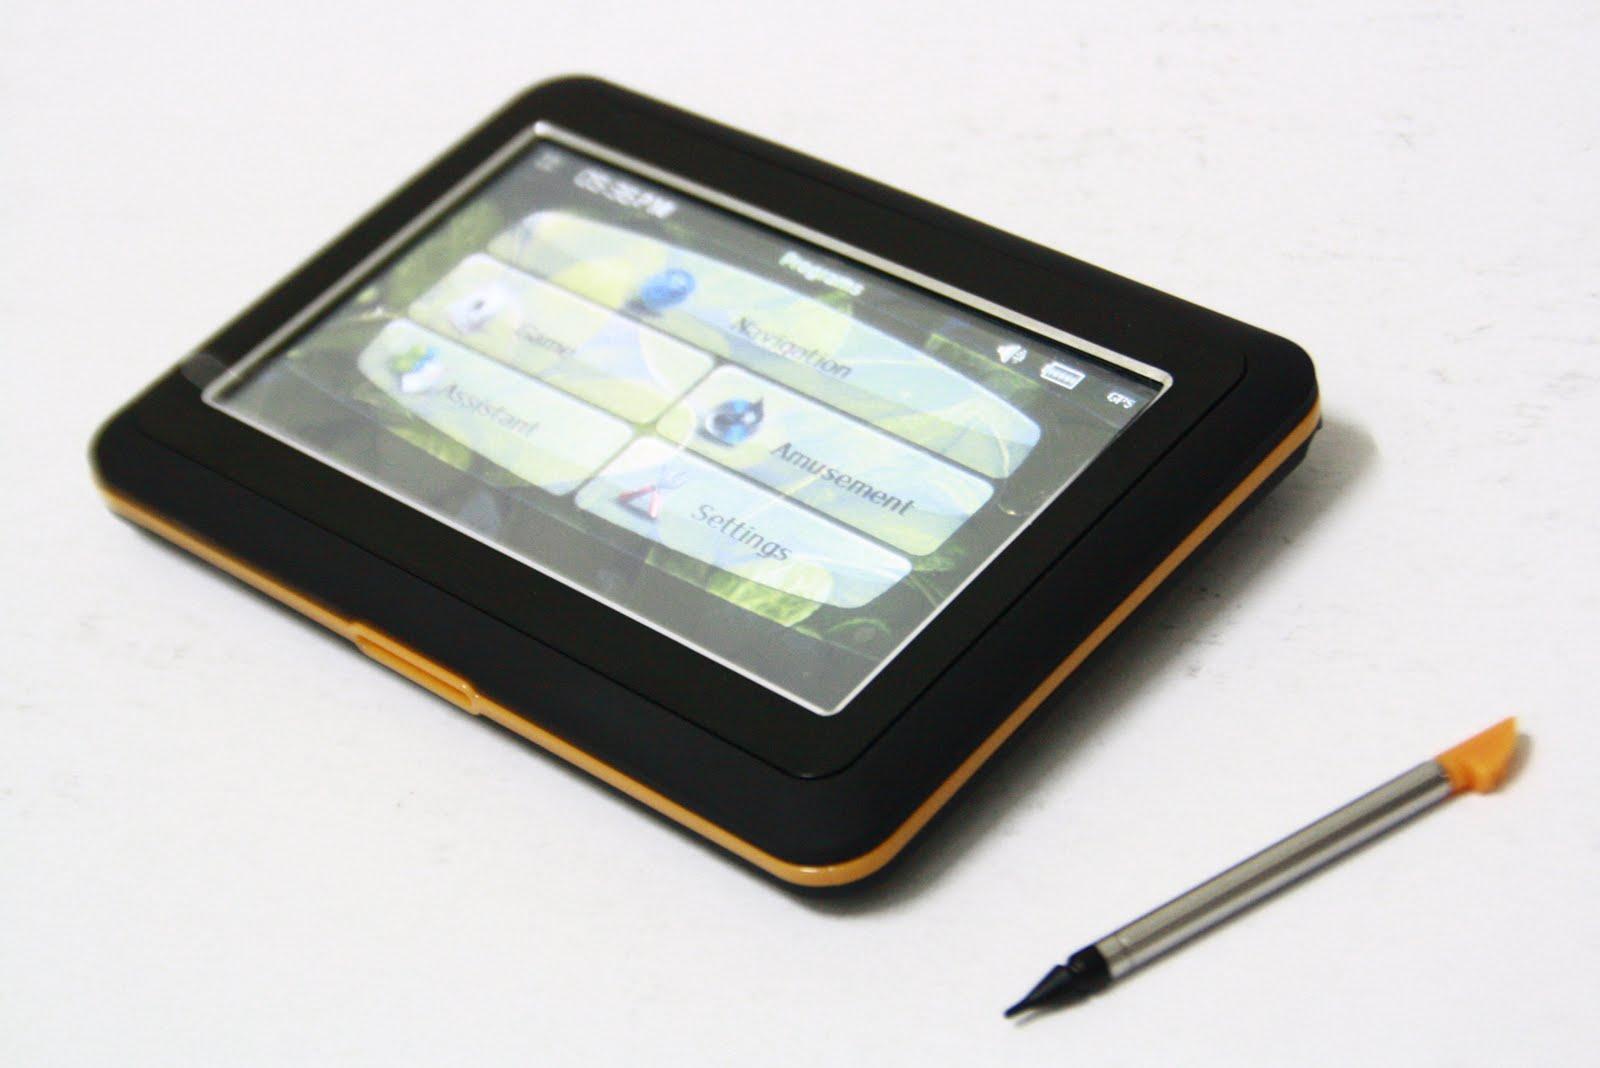 GPS Unit - Garmin, PapagoX3, PapagoX5, iGO, MapKing